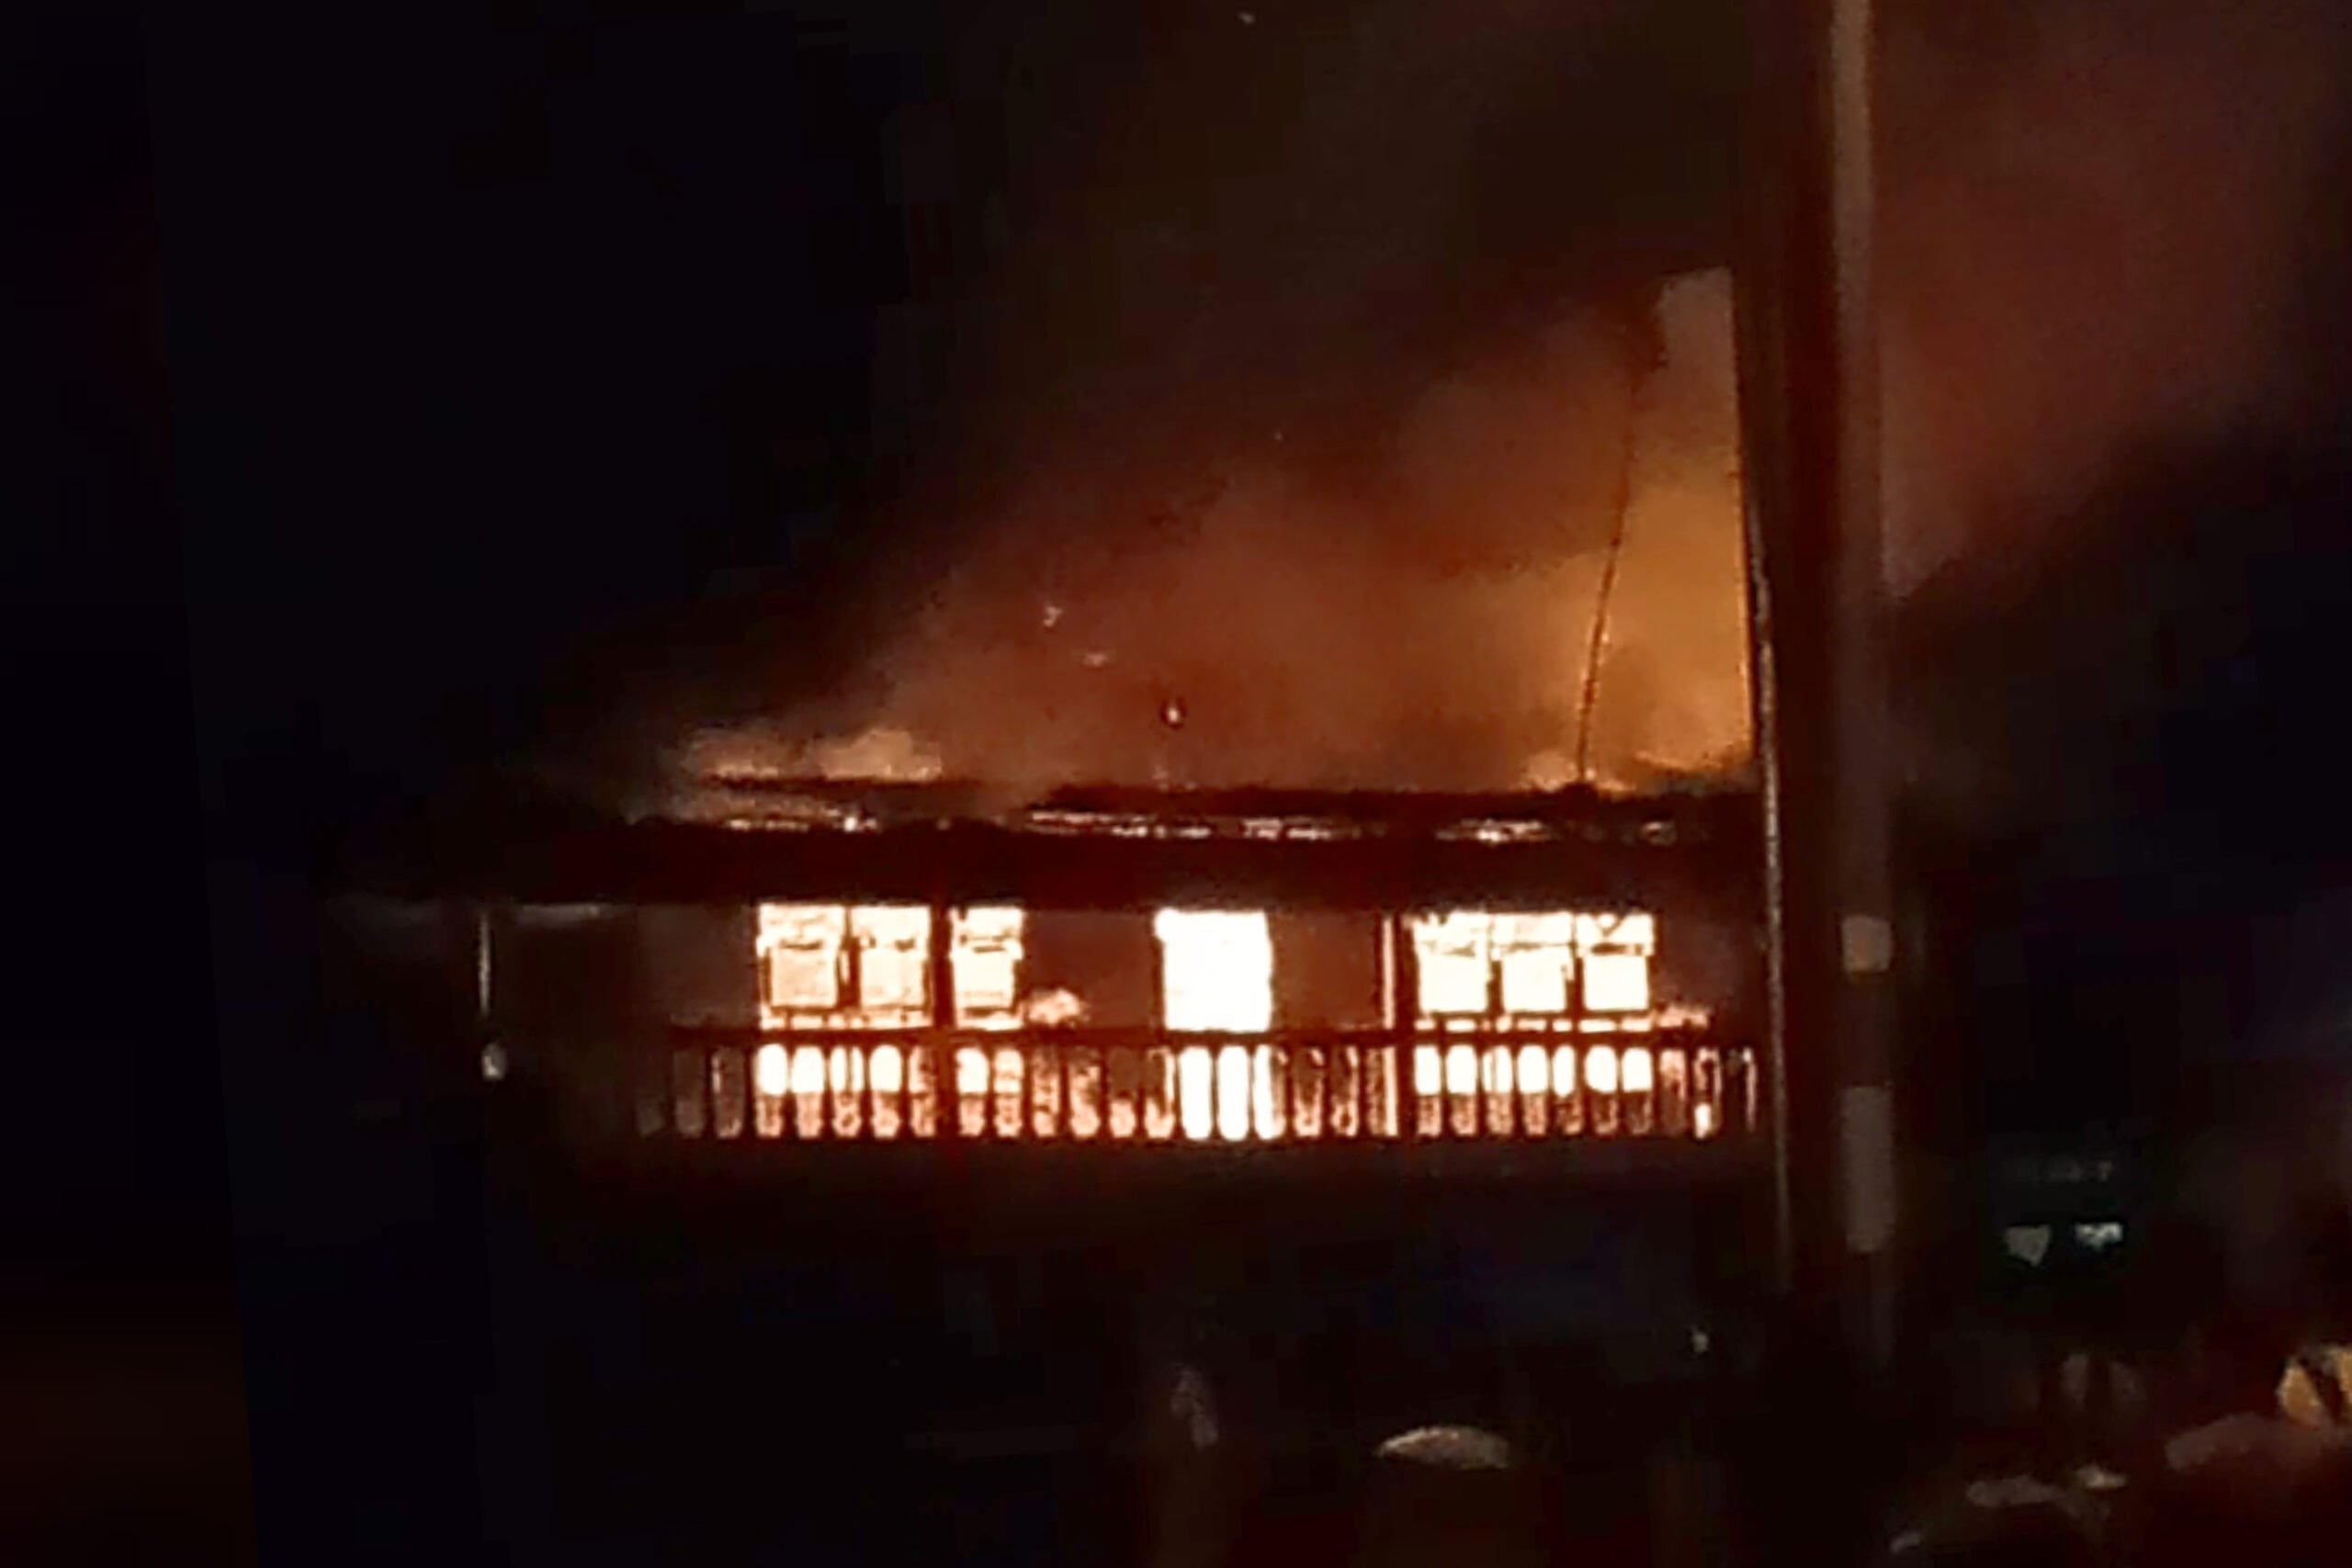 Ponpes Raudlatul Ulum Ciampea Bogor Terbakar 233